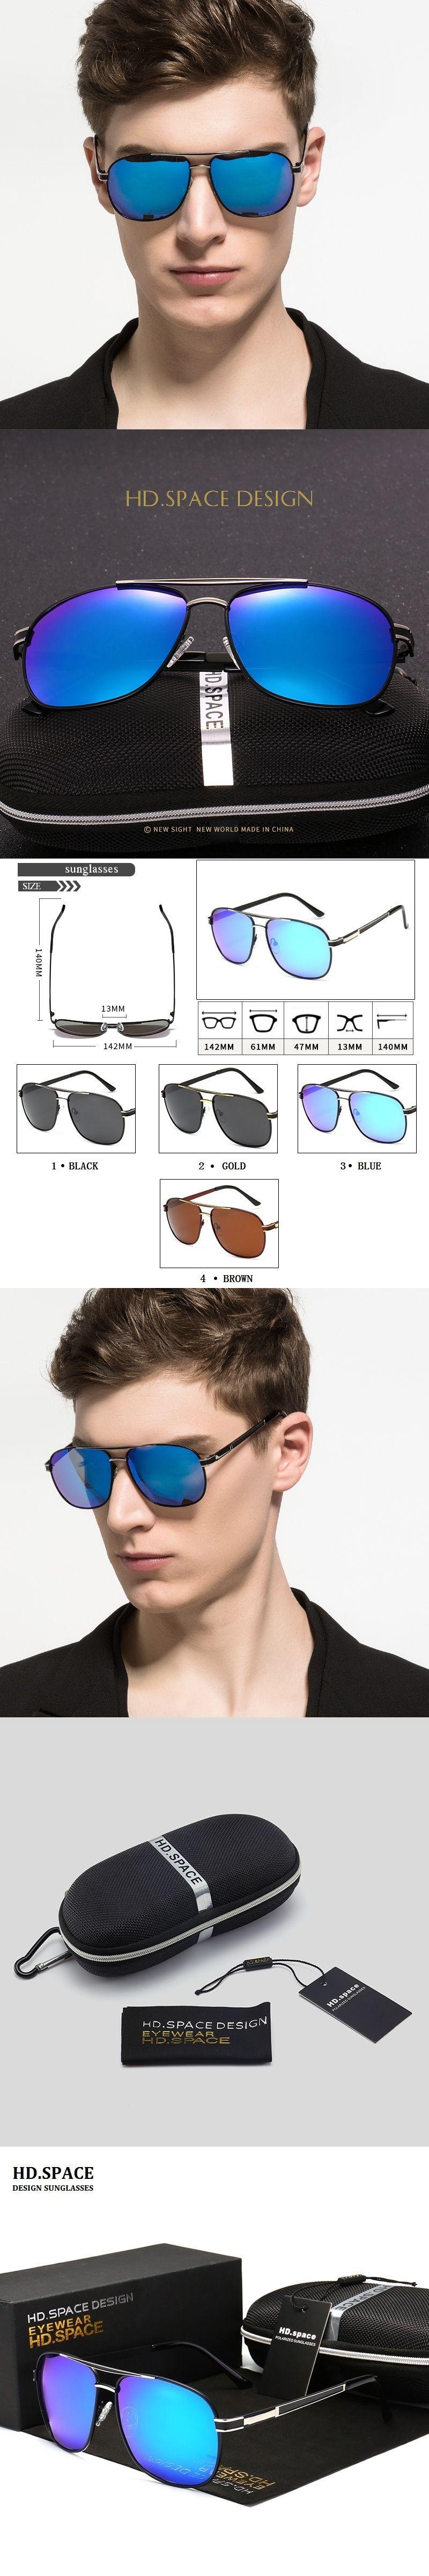 4f296c38cd Polarized Sunglasses Men Original Brand HD Polaroid Lens Reflective Coating  Driving Sunglasses Vintage Male Google Eyewear